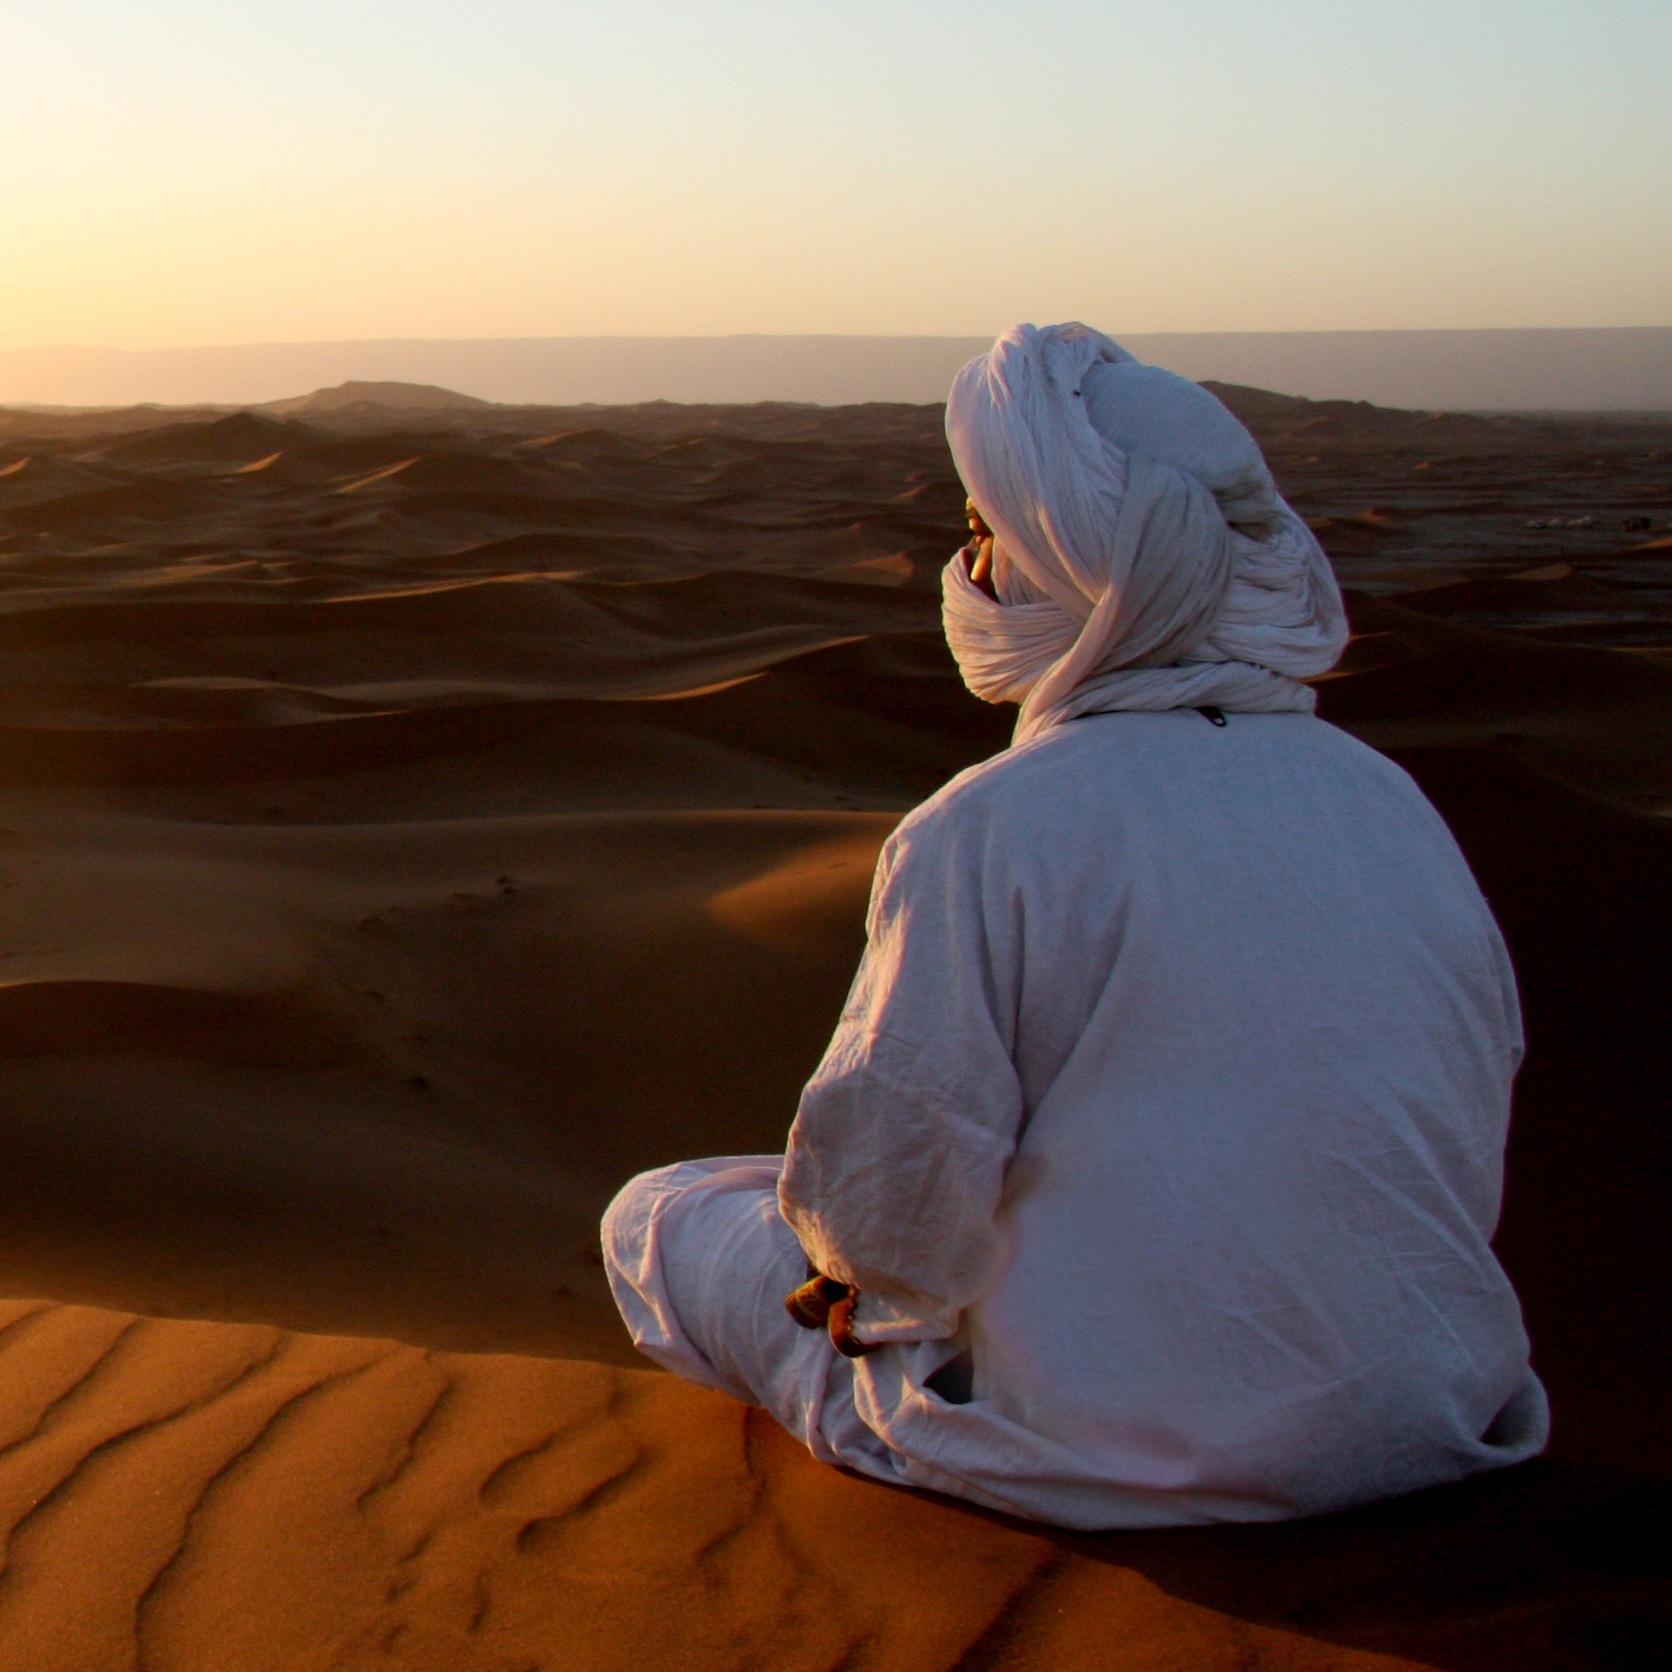 destination maroc désert